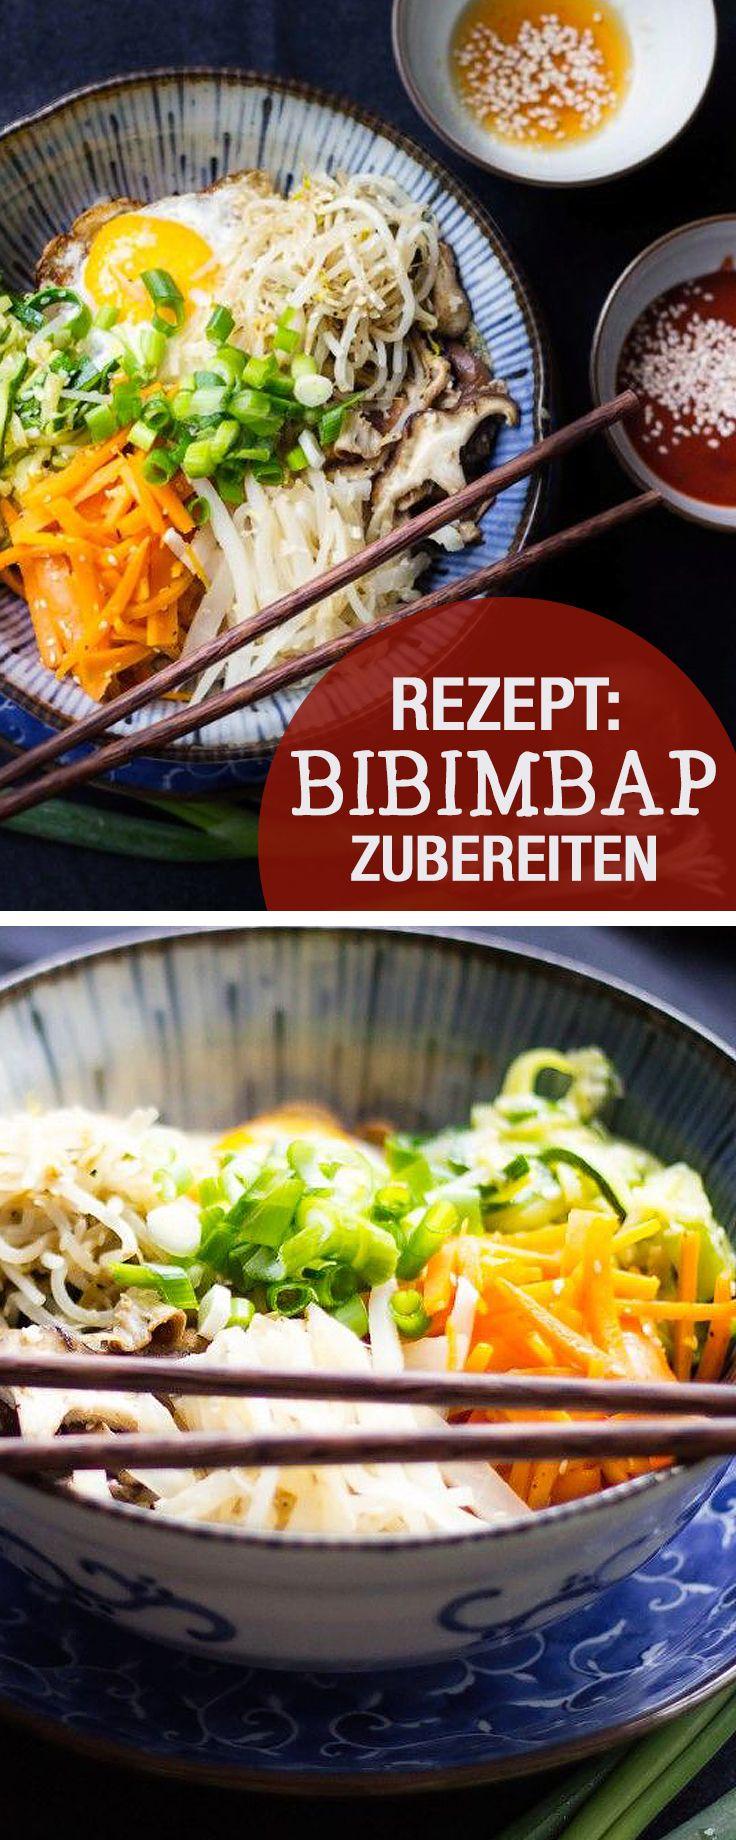 Rezept für Bibimbap, asiatische Rezepte / recipe for bibimbap, asian recipes, healthy via DaWanda.com